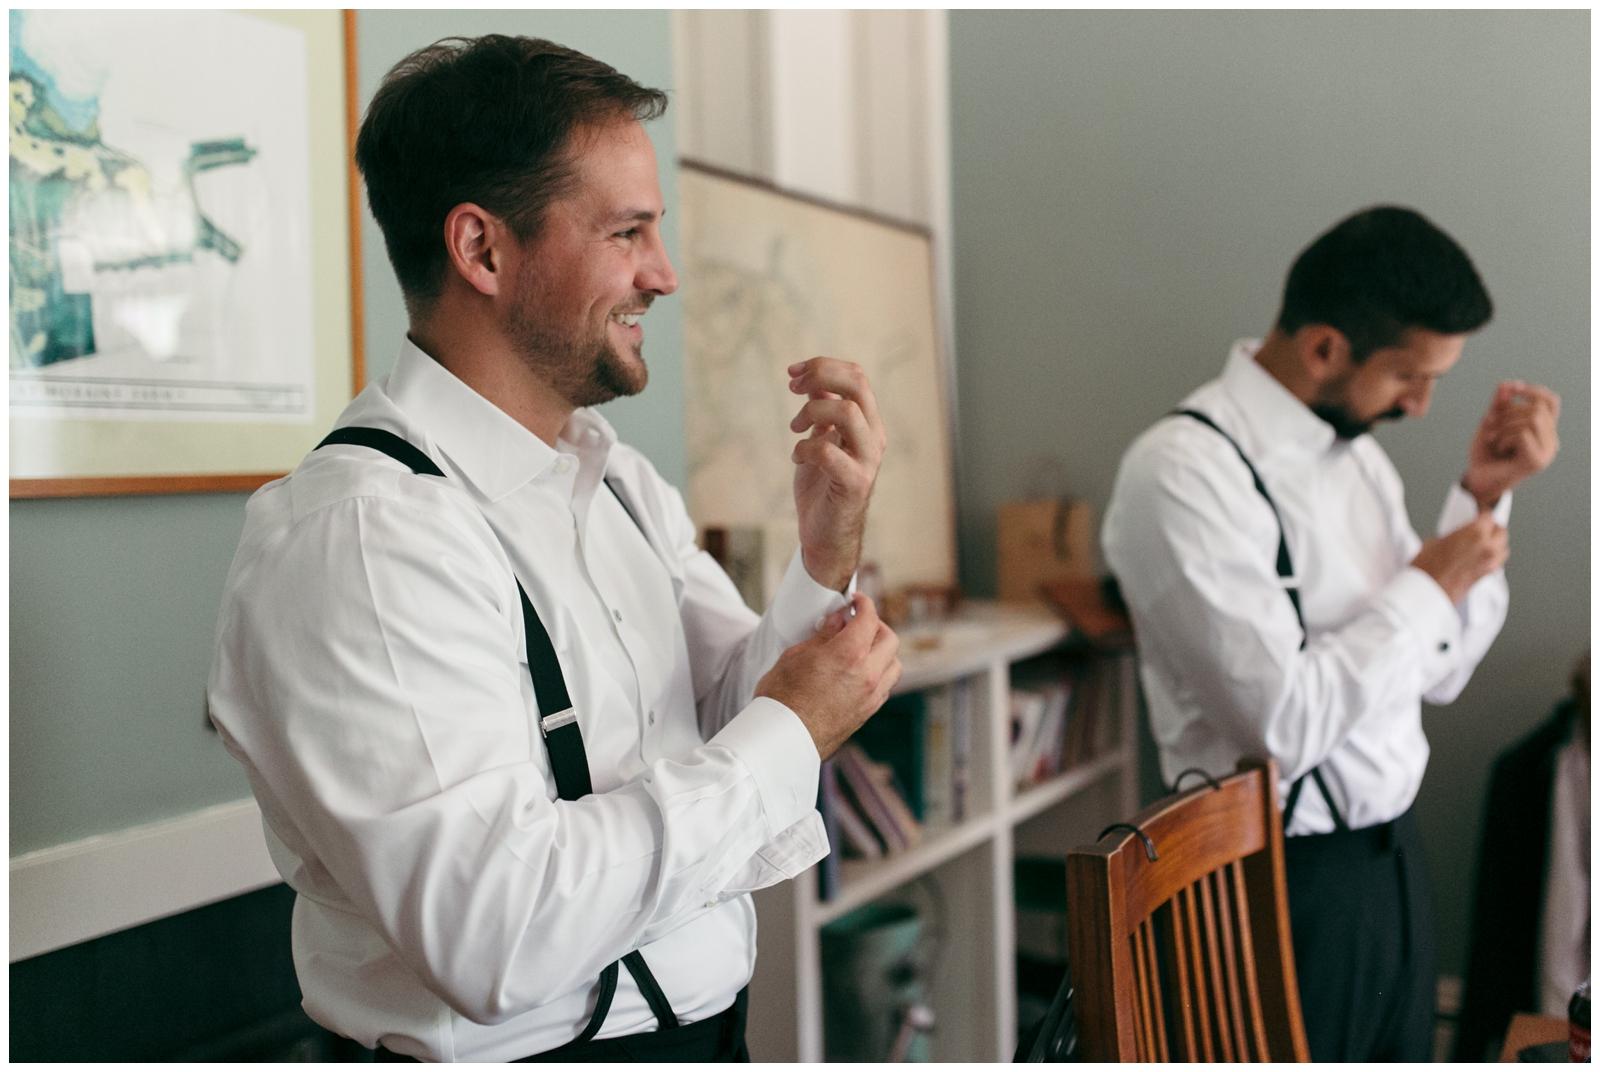 Moraine-Farm-wedding-Bailey-Q-Photo-Massachusetts-wedding-photpgrapher-007.jpg